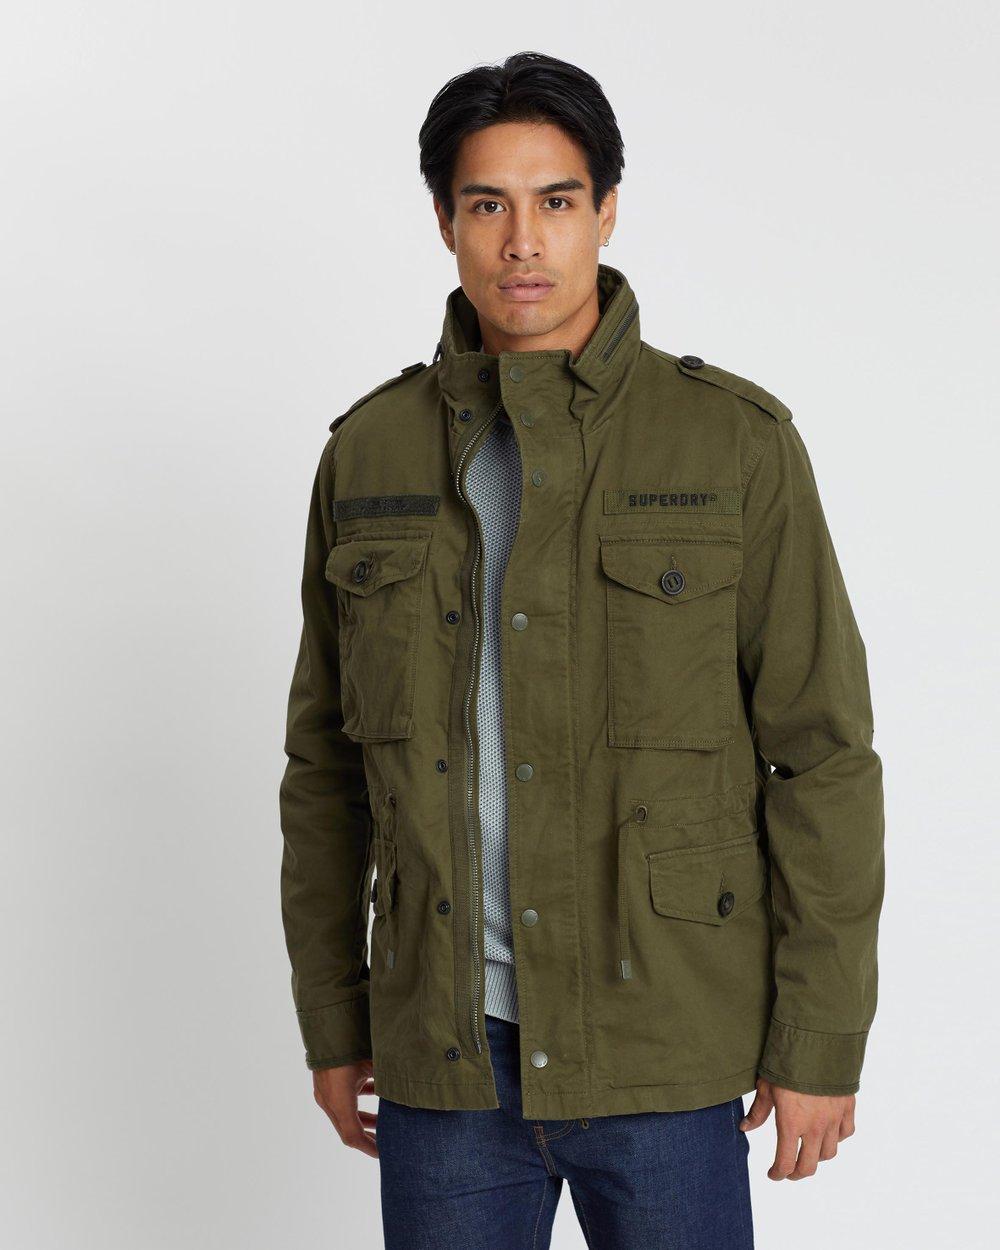 Superdry Men/'s Rookie Field Jacket In Ivy Green